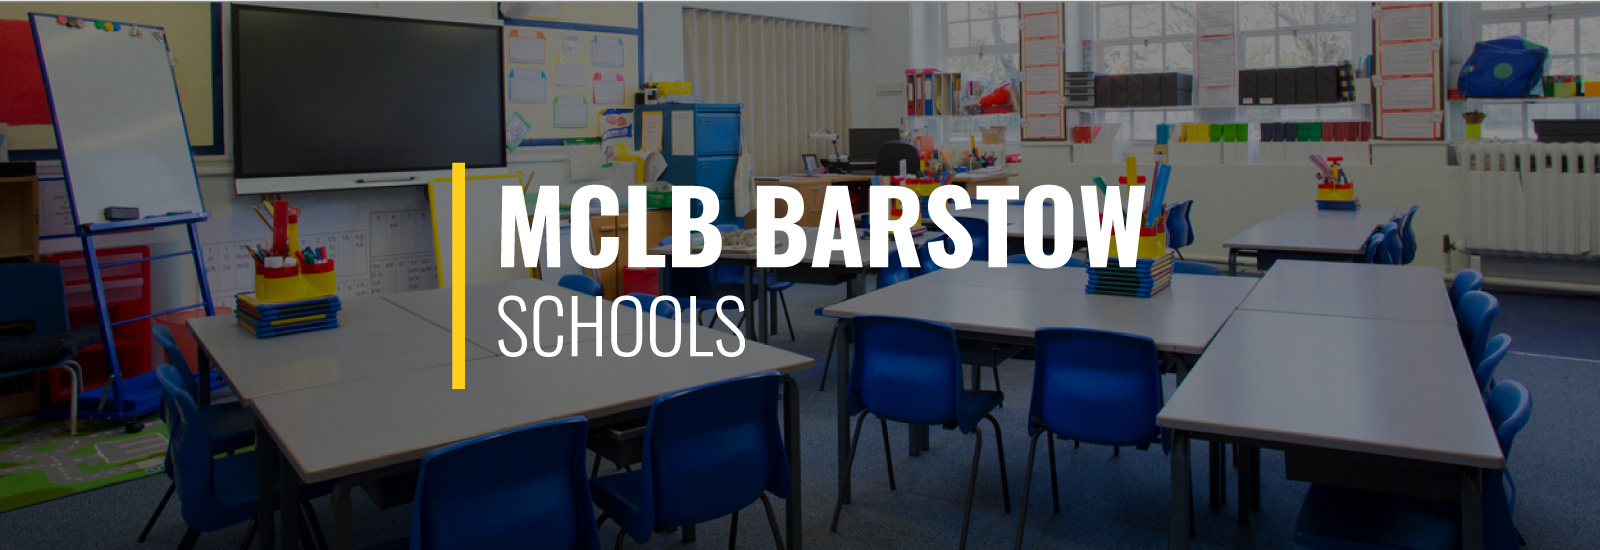 MCLB Barstow Schools